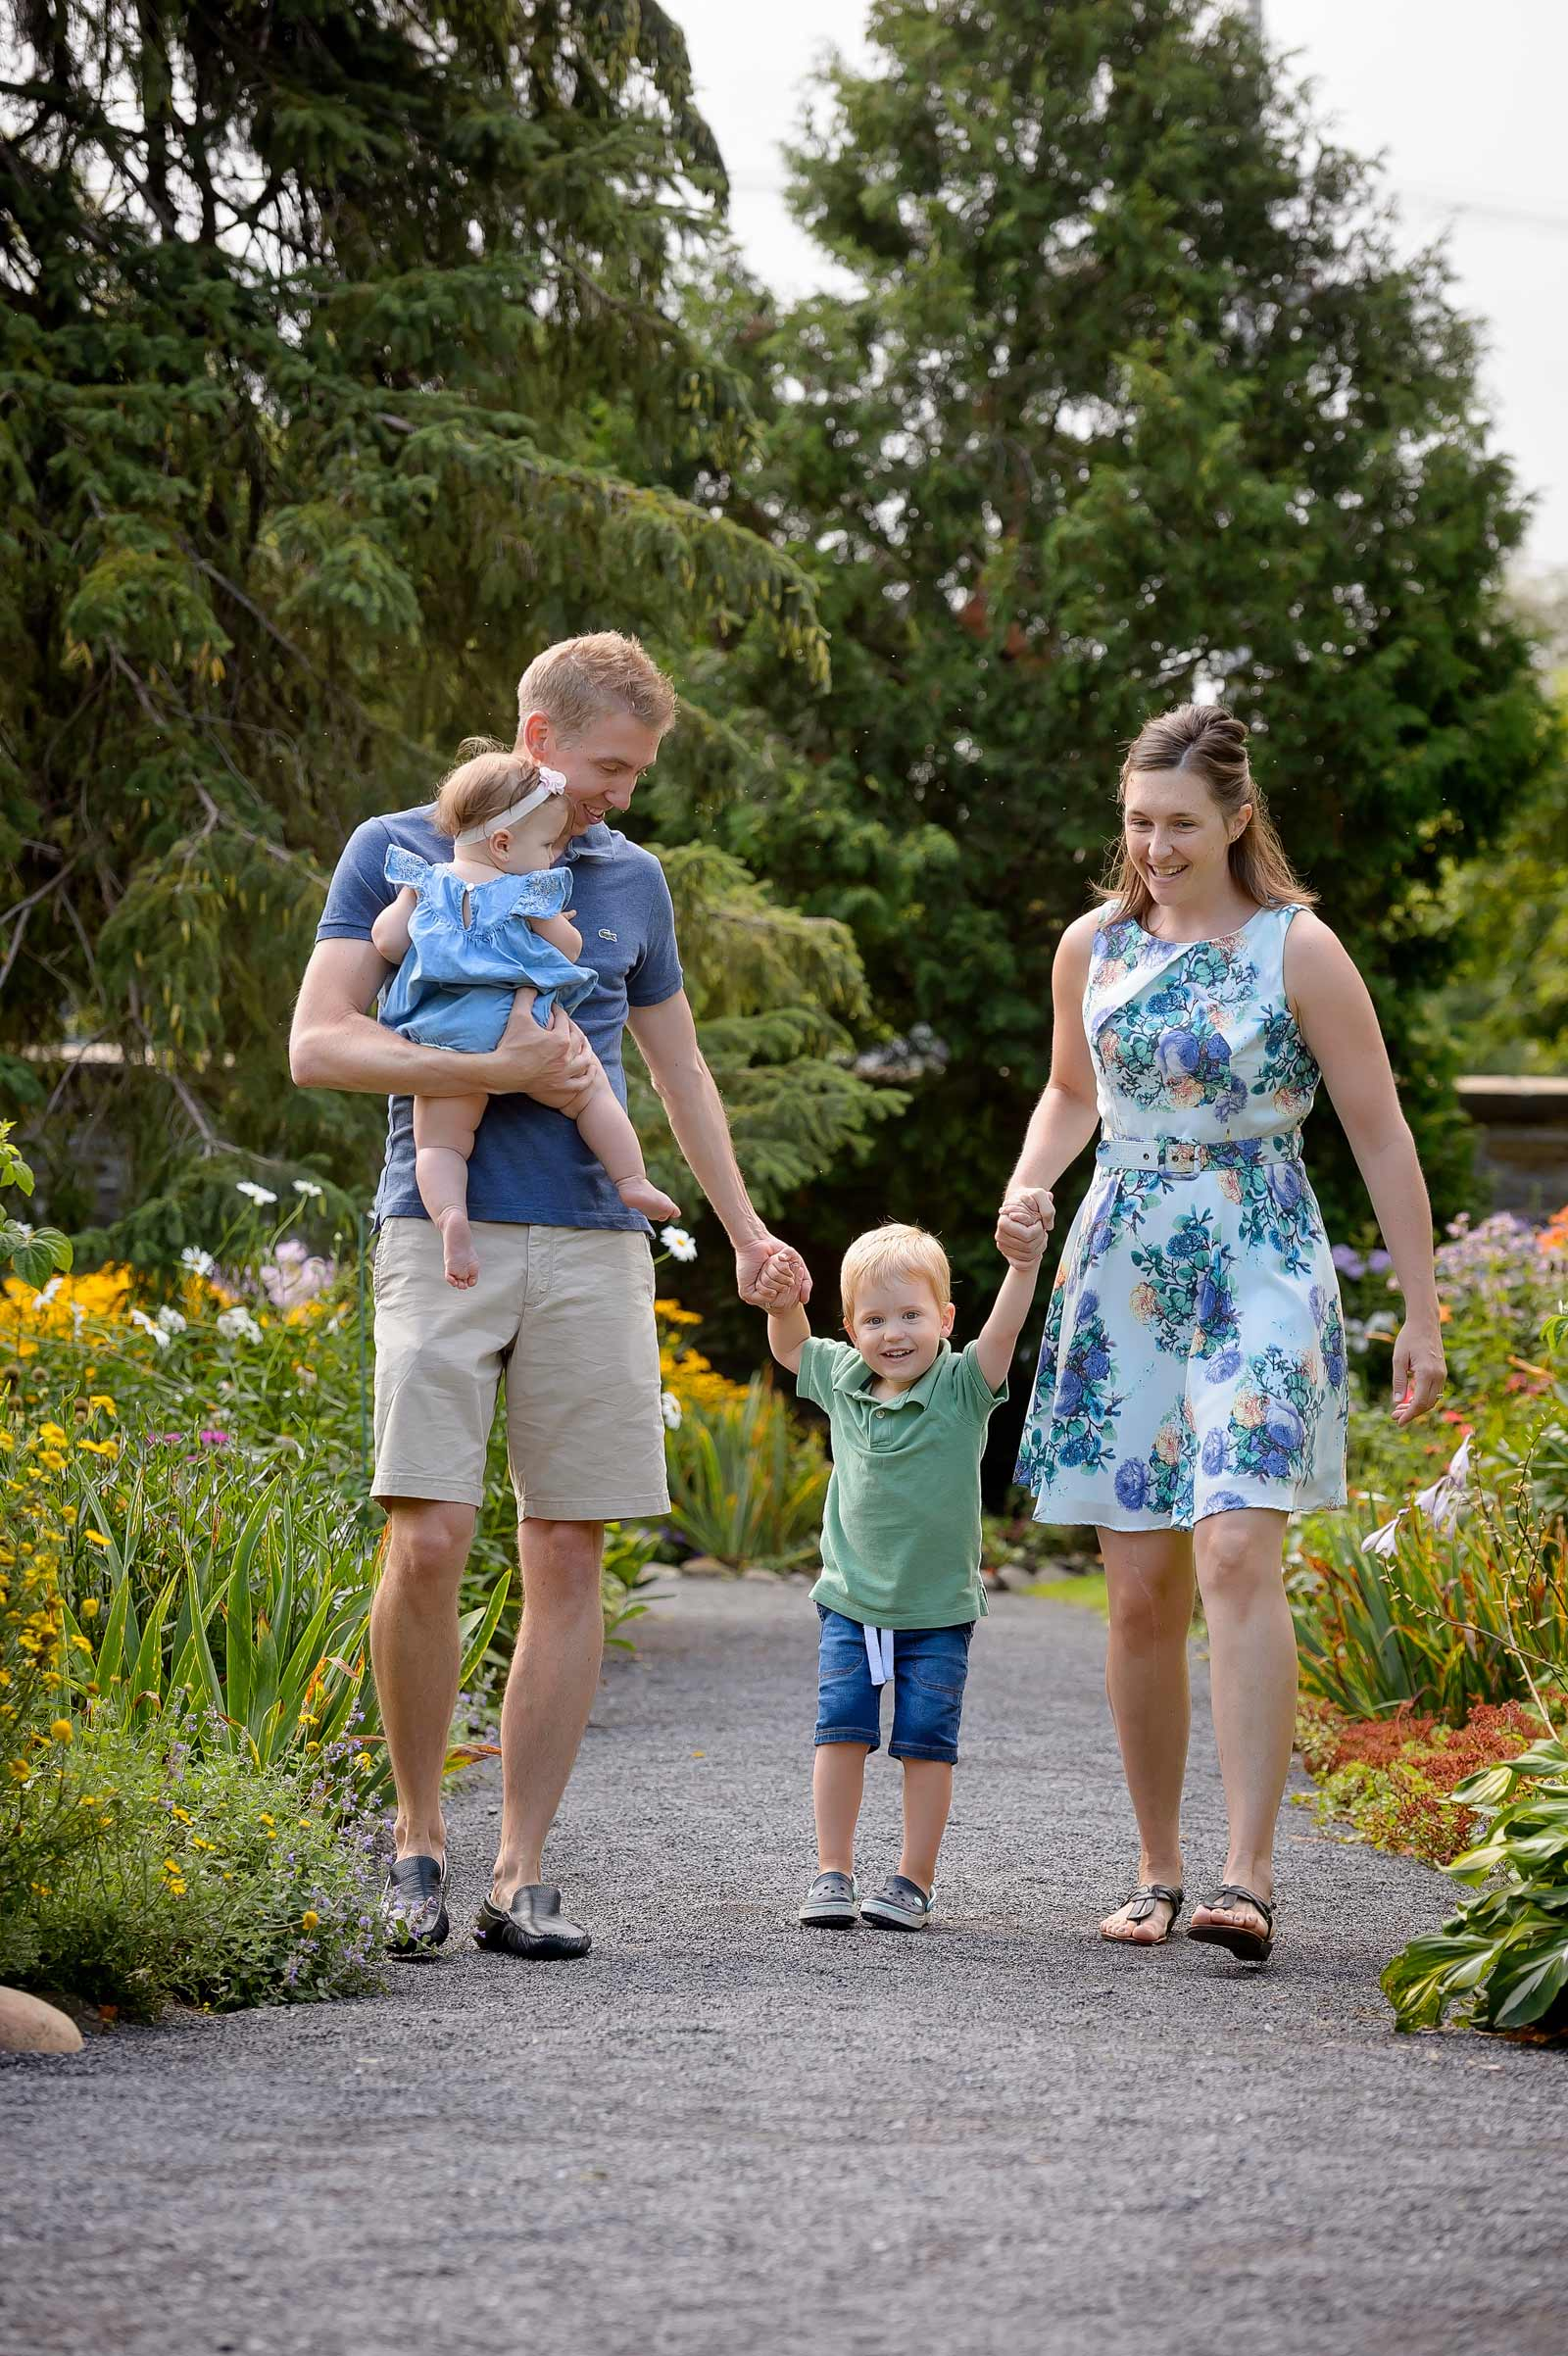 Walking through the paths at Maple Lawn Gardens